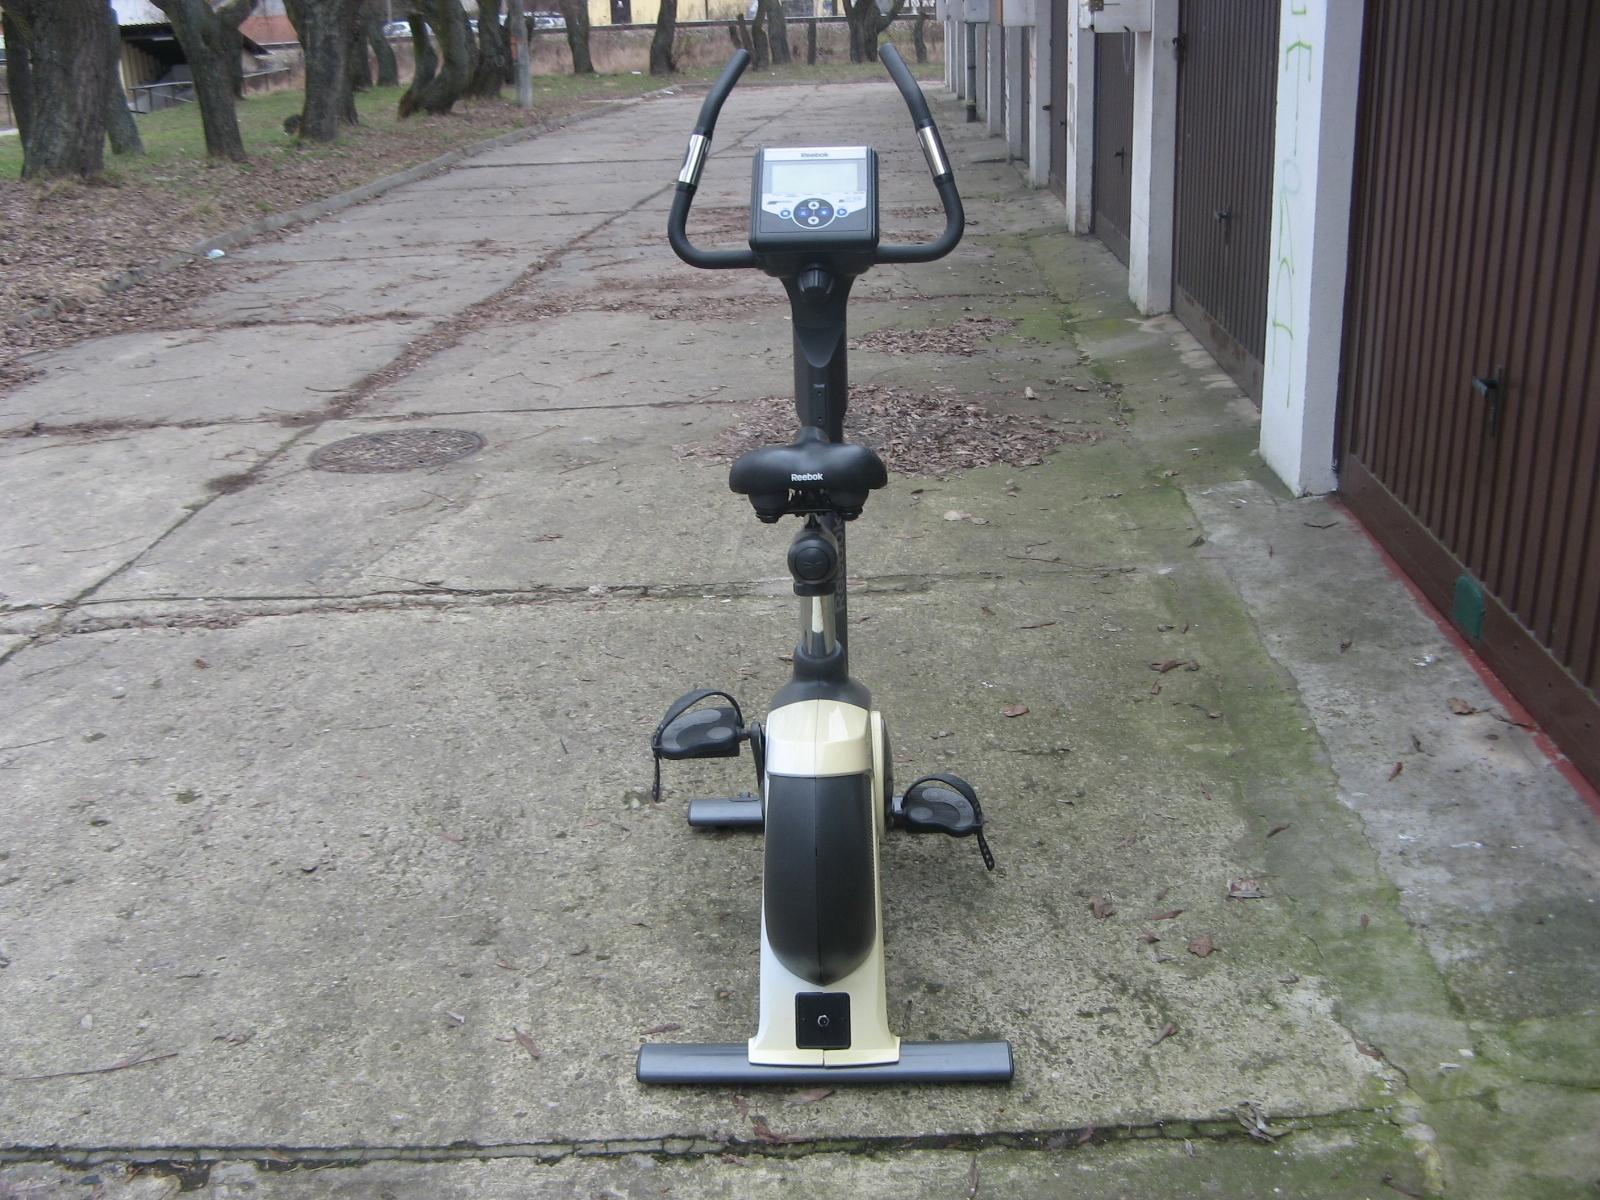 Rower Rebok B 5.1e treningowy z ergometrem Zadbany